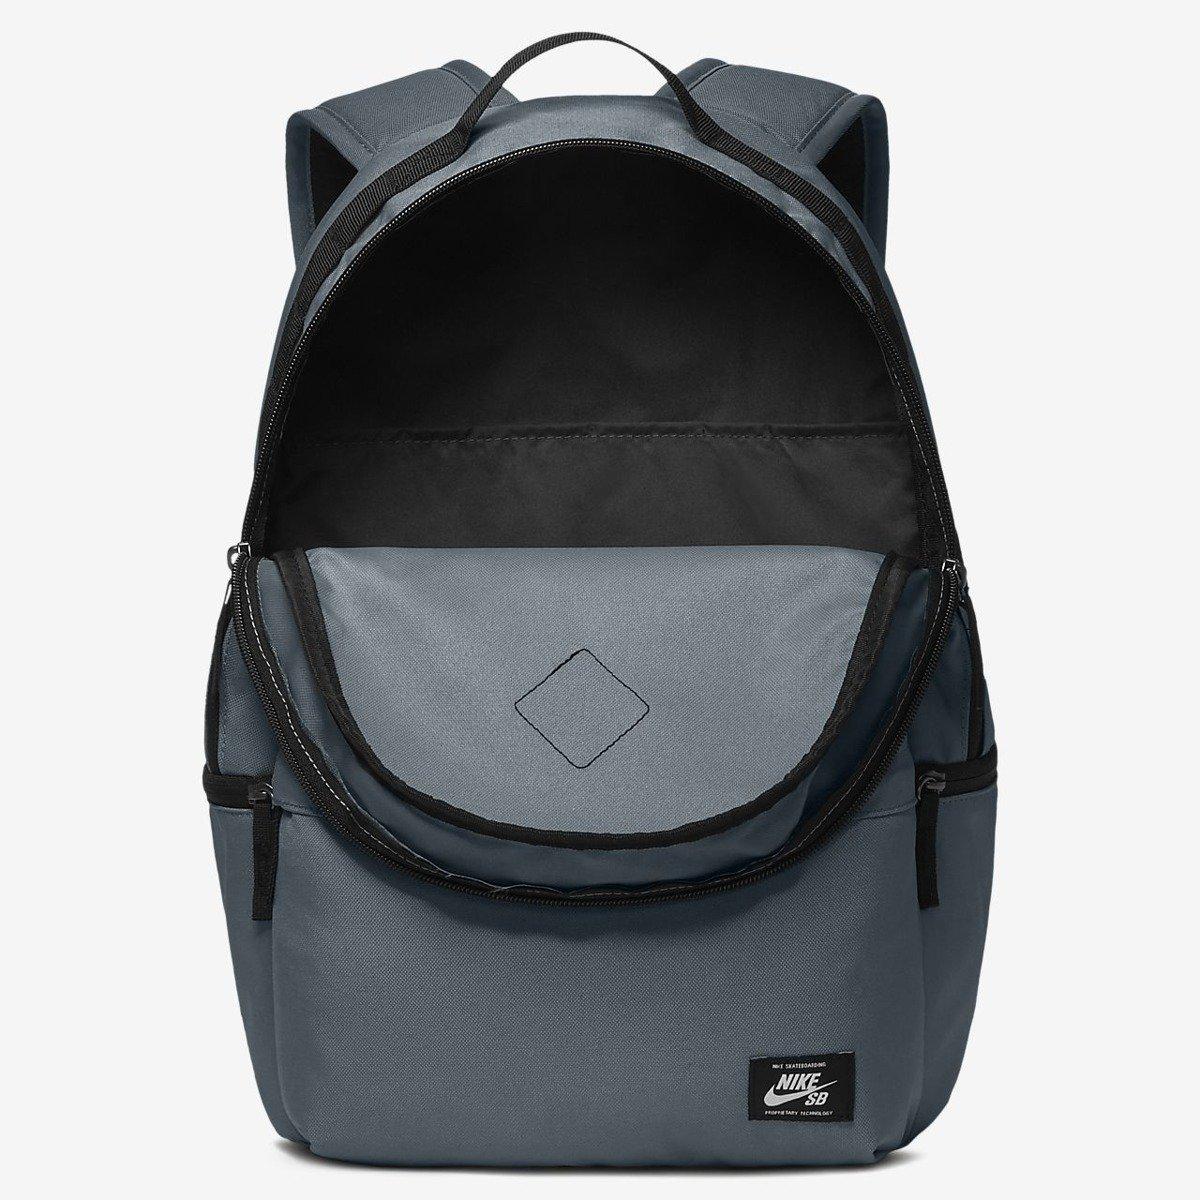 078eaad21cfe1 Miniramp Skateshop plecak Nike SB Icon Backpack DEEP JUNGLE BLACK WHITE